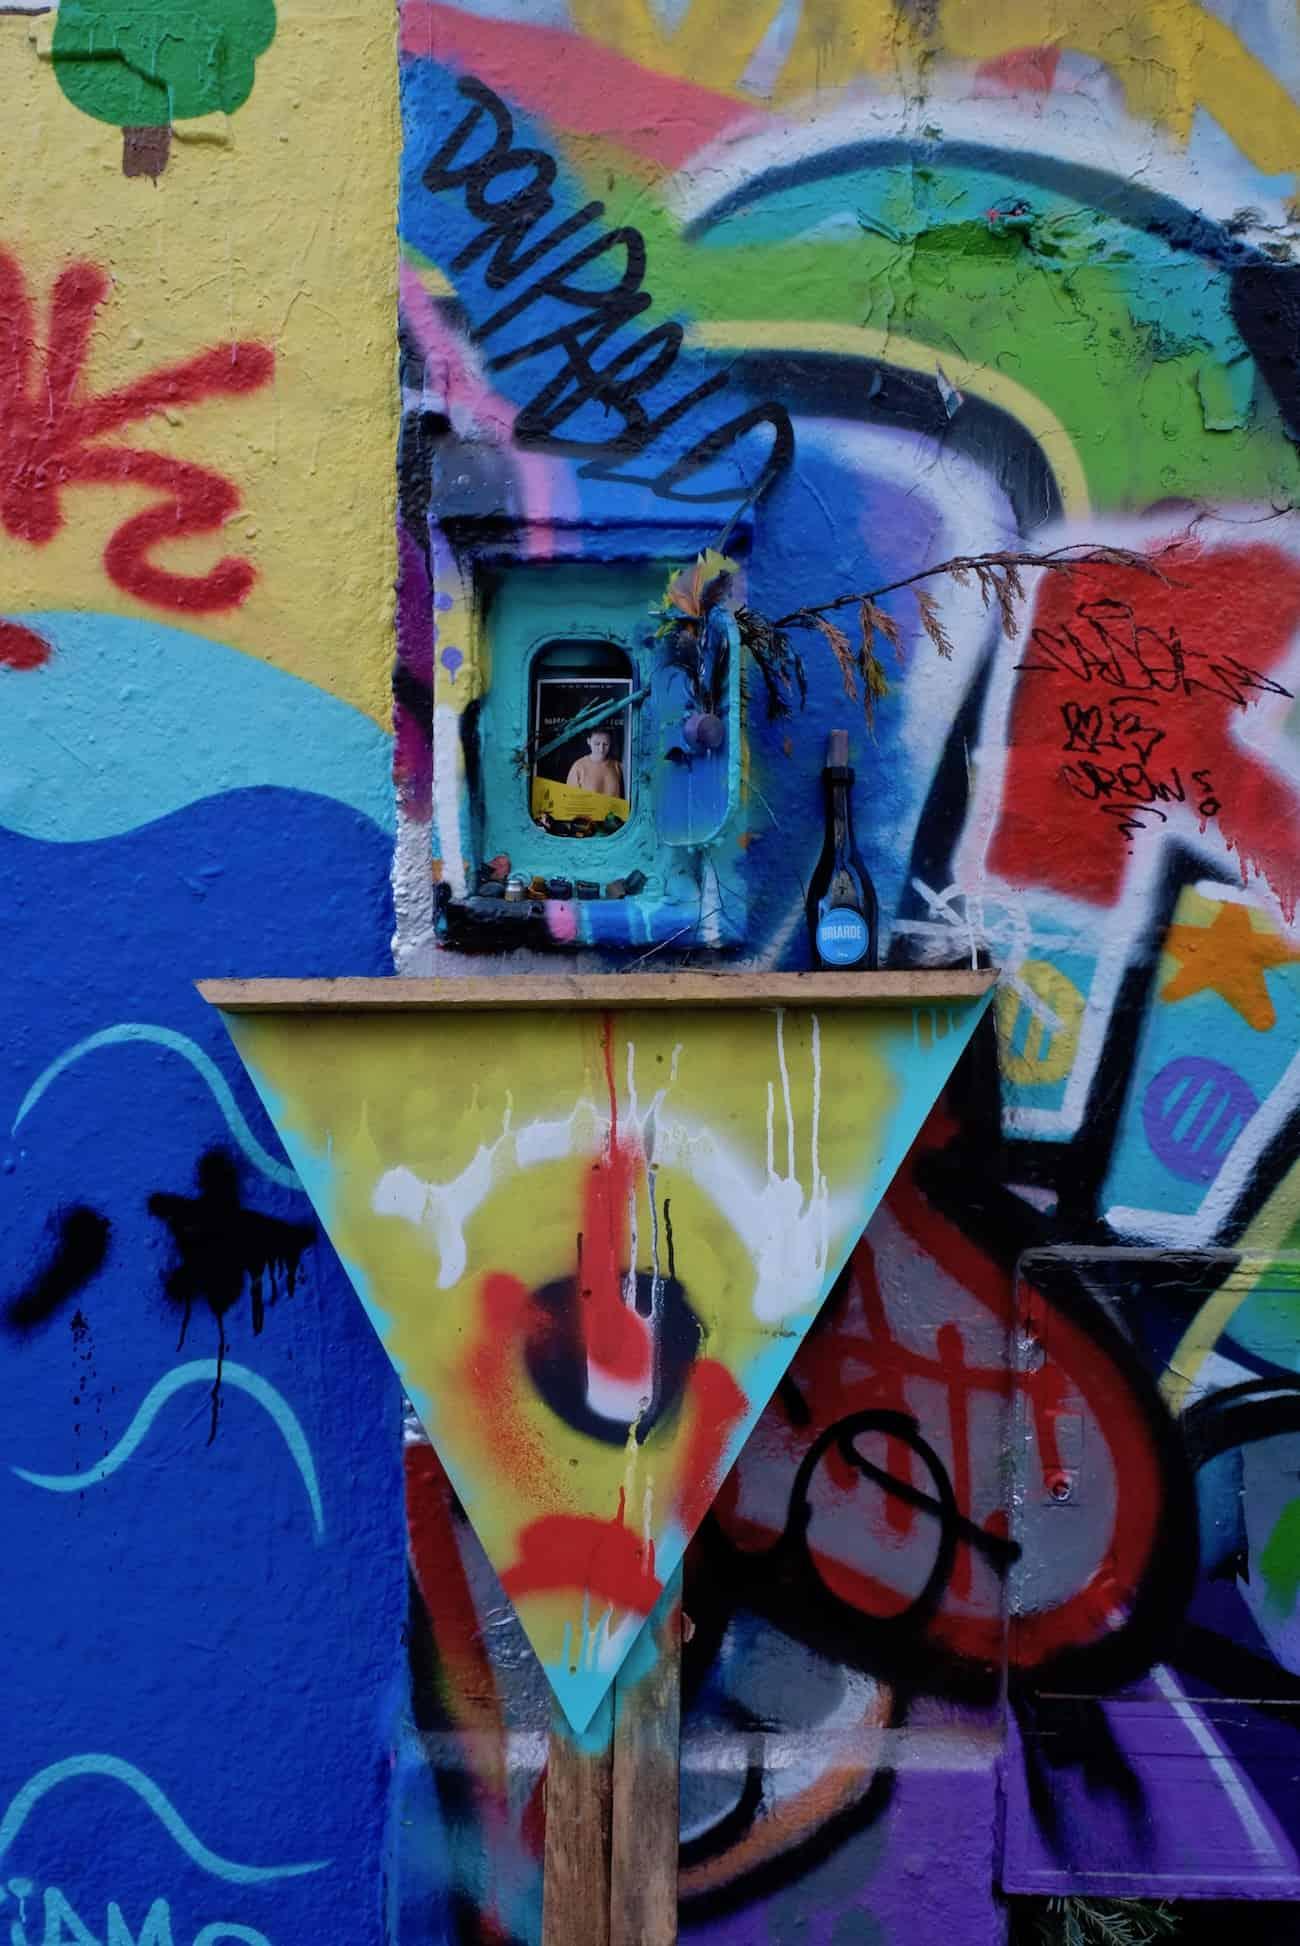 balade-rue-denoyez-street-art-paris20-menilmontant-belleville-oberkampf